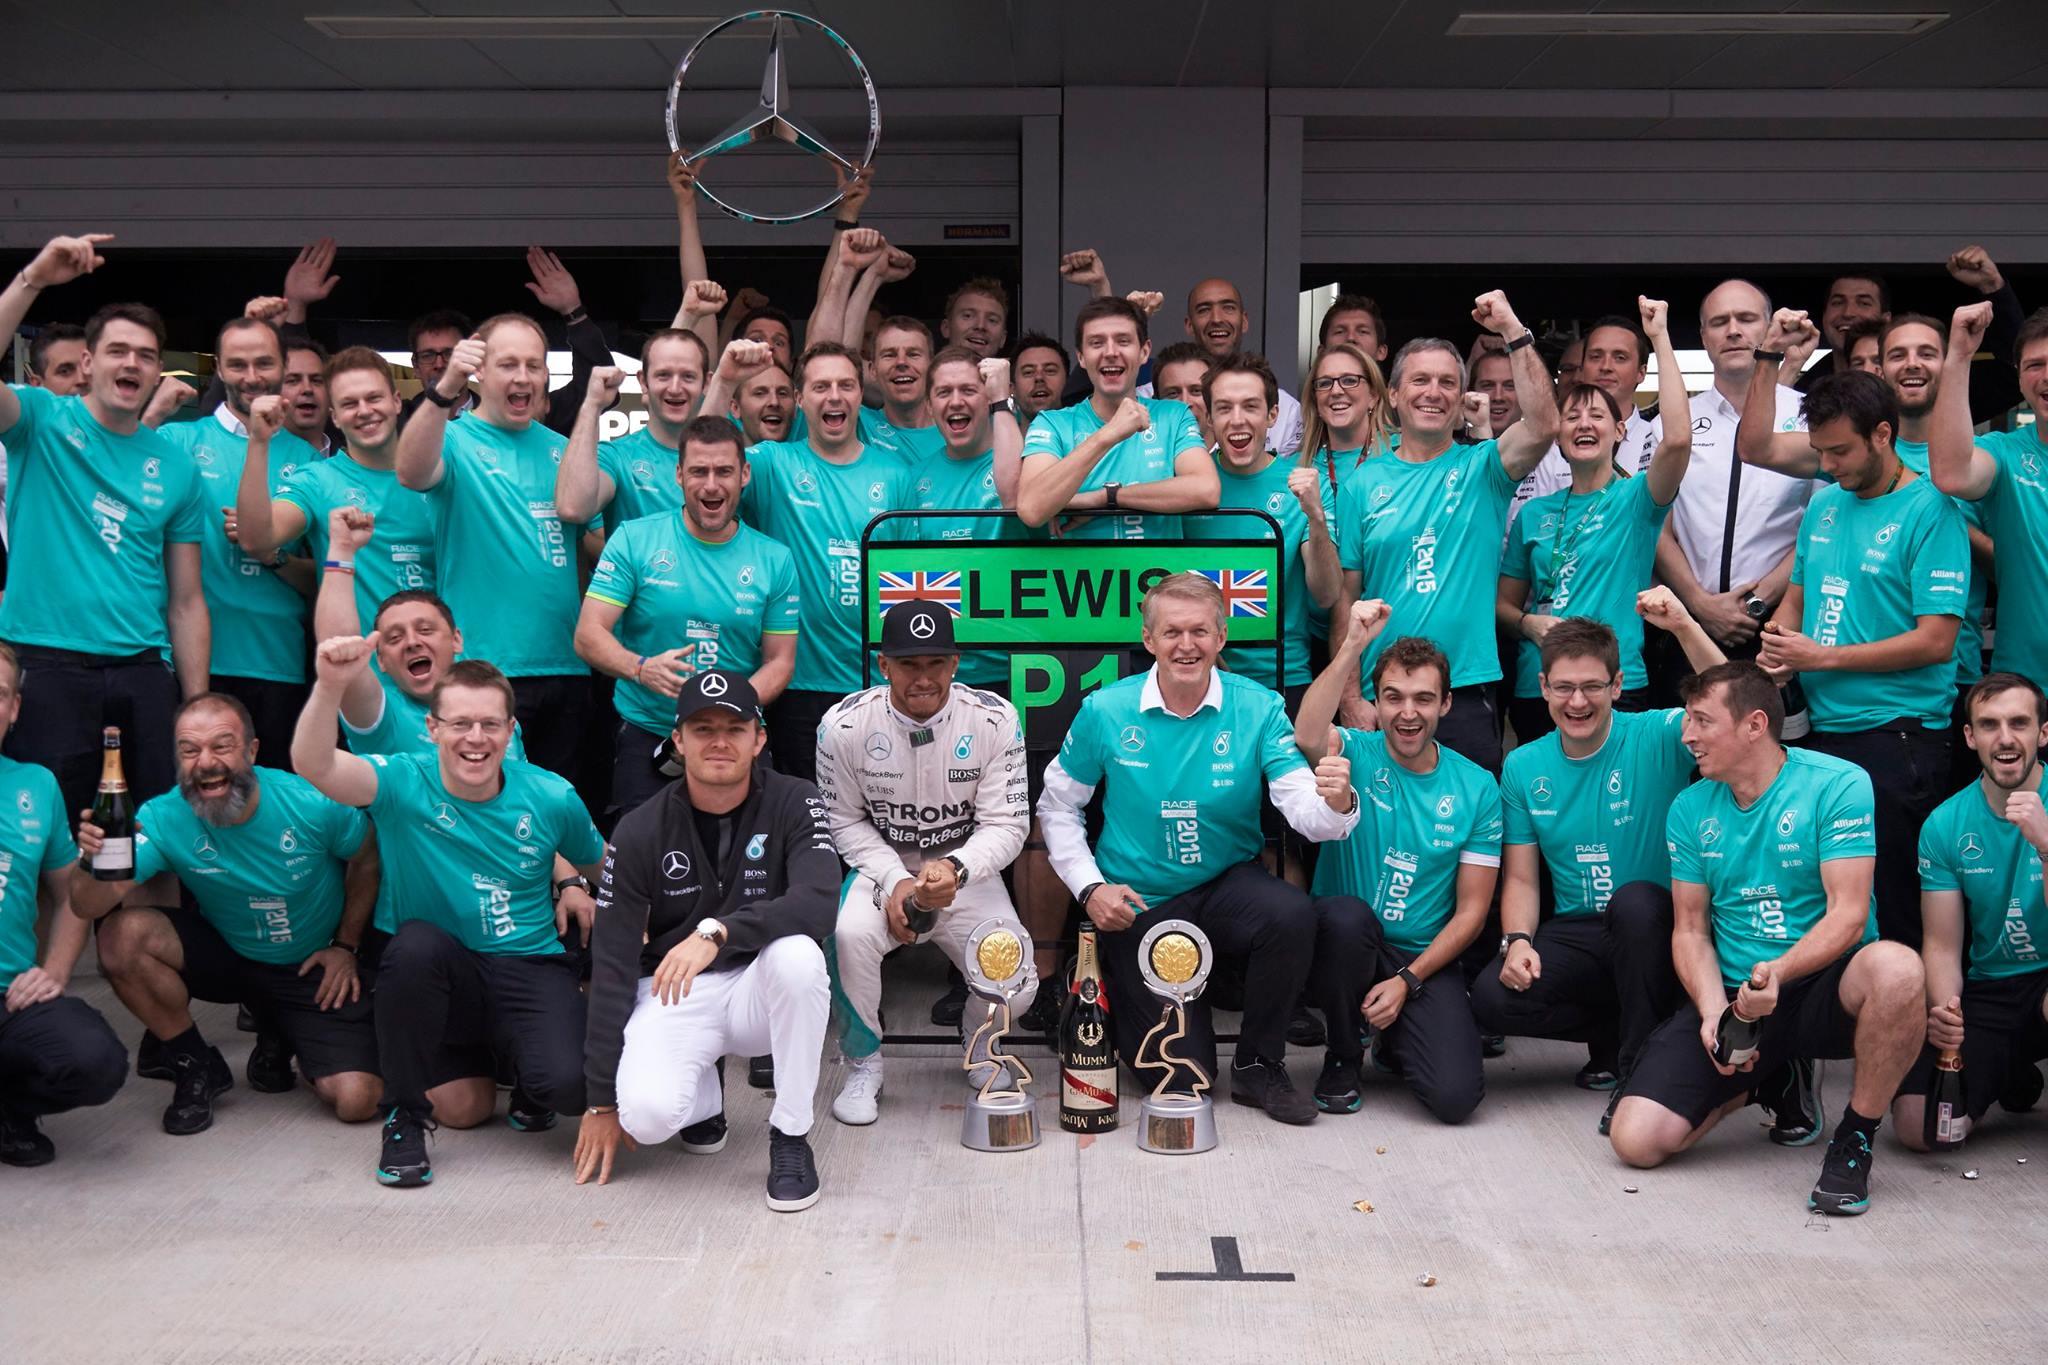 Mercedes Campeão dos Construtores de 2015